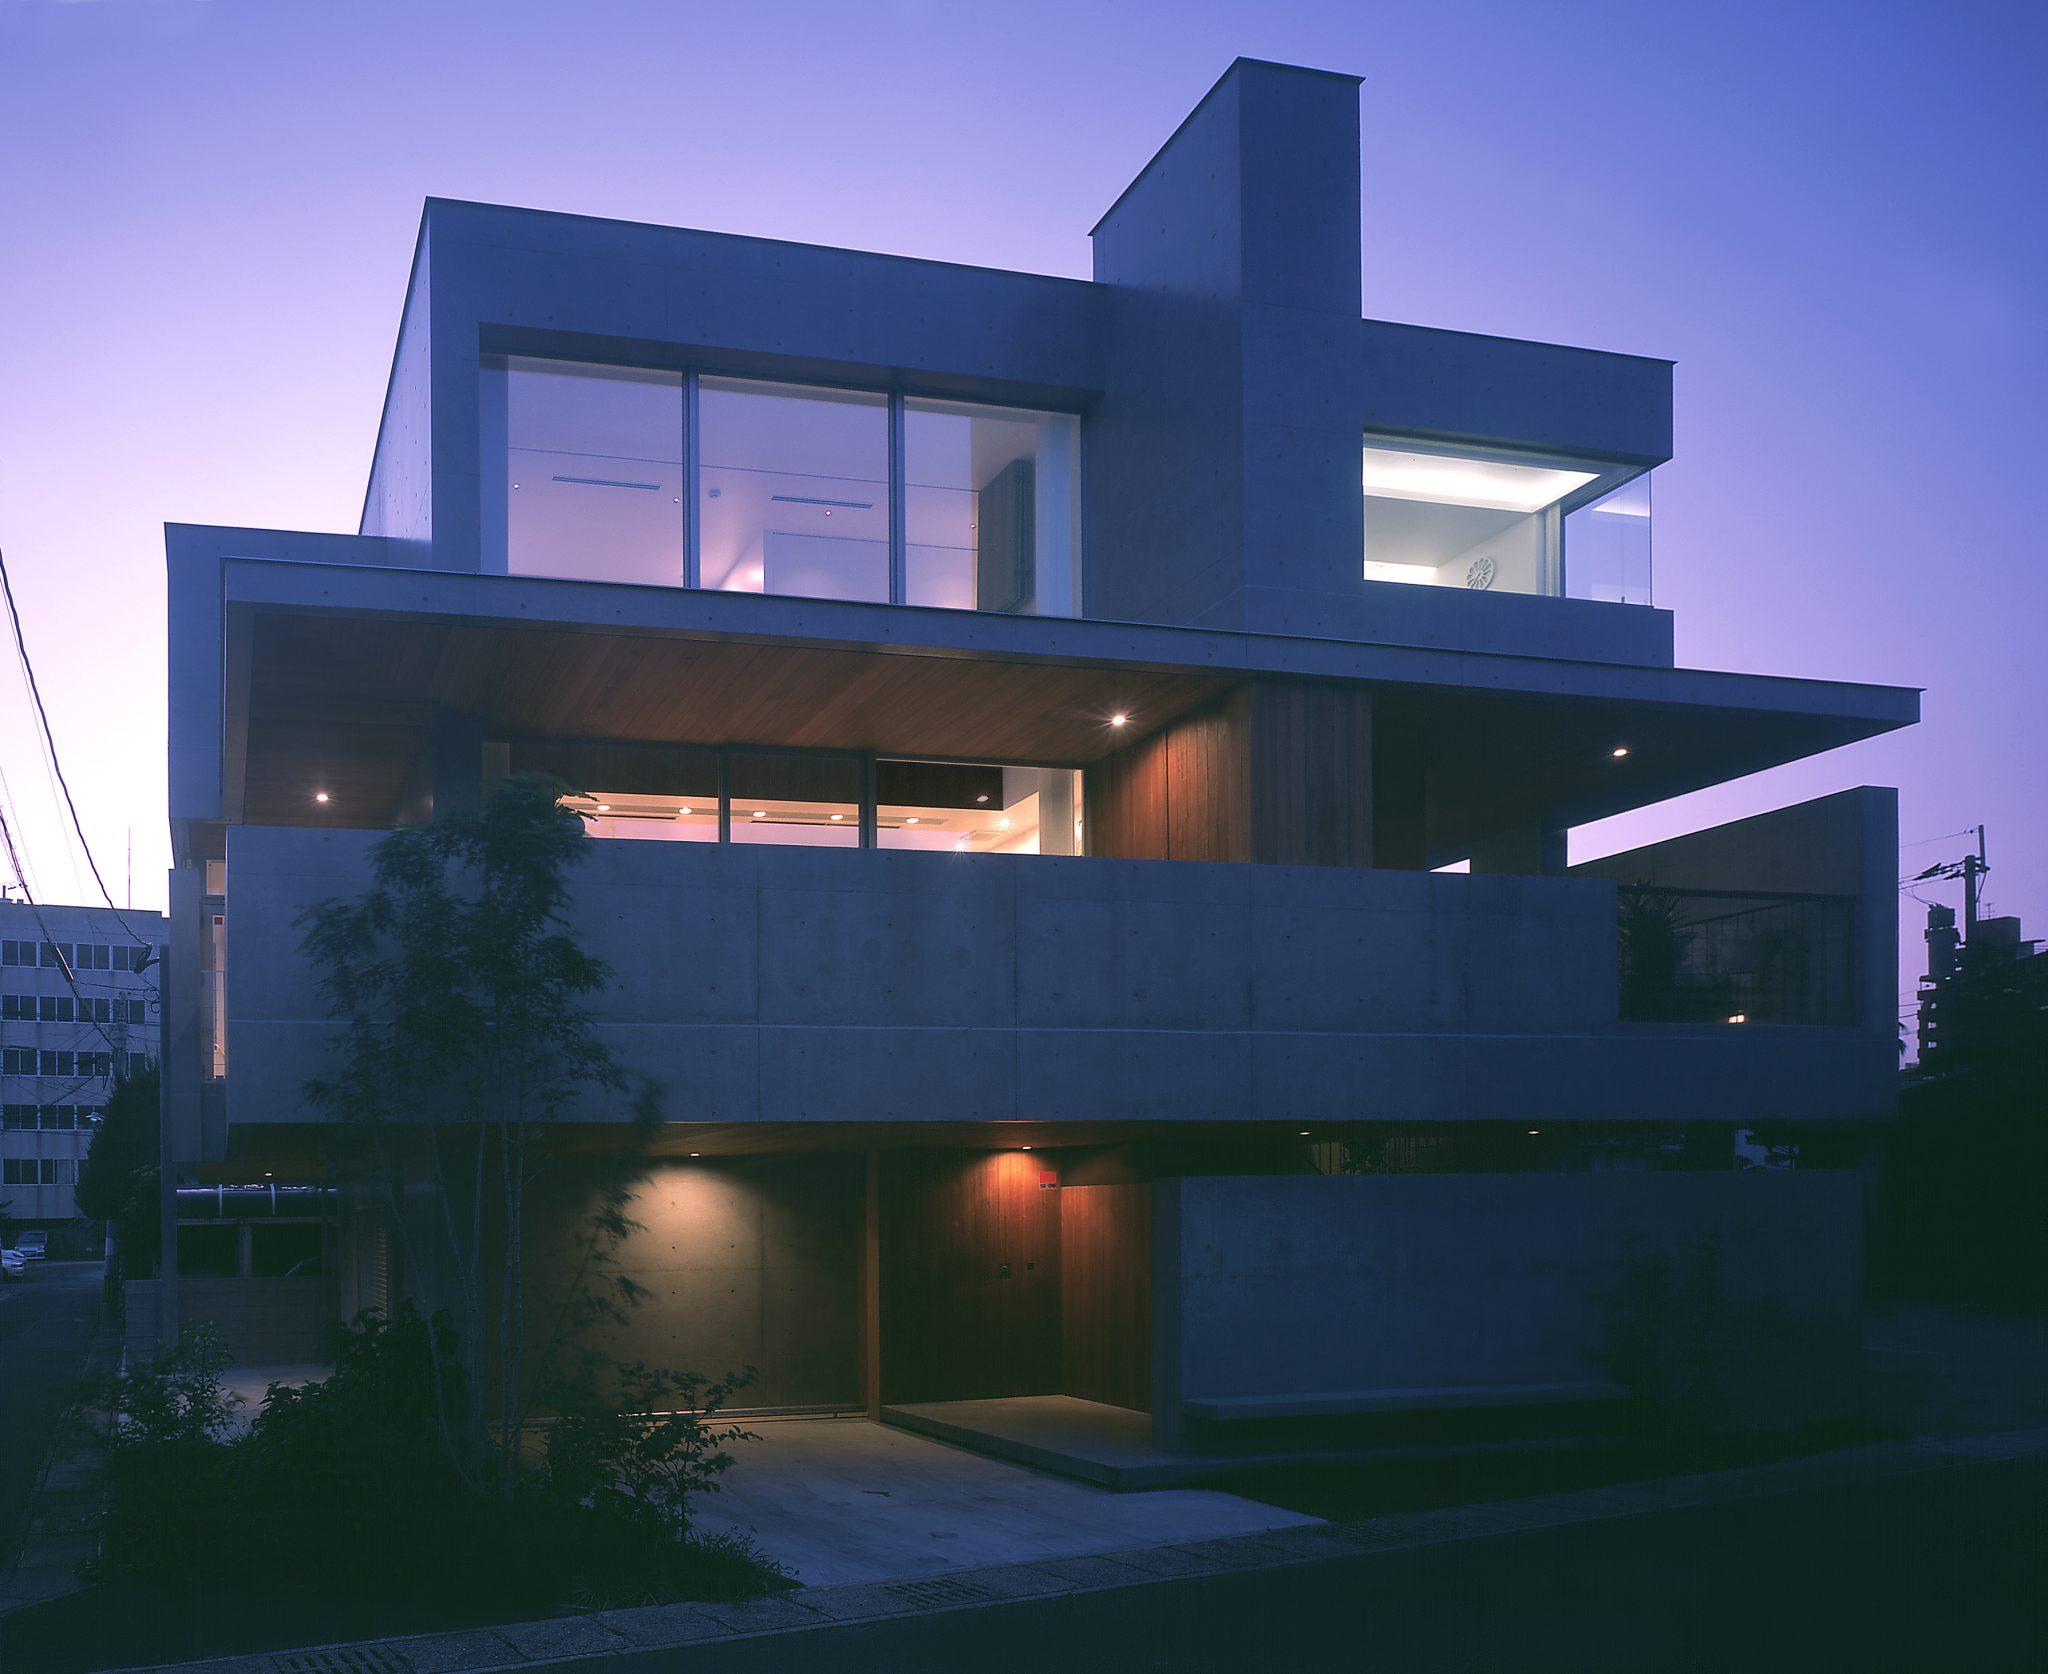 S residence (Arata)